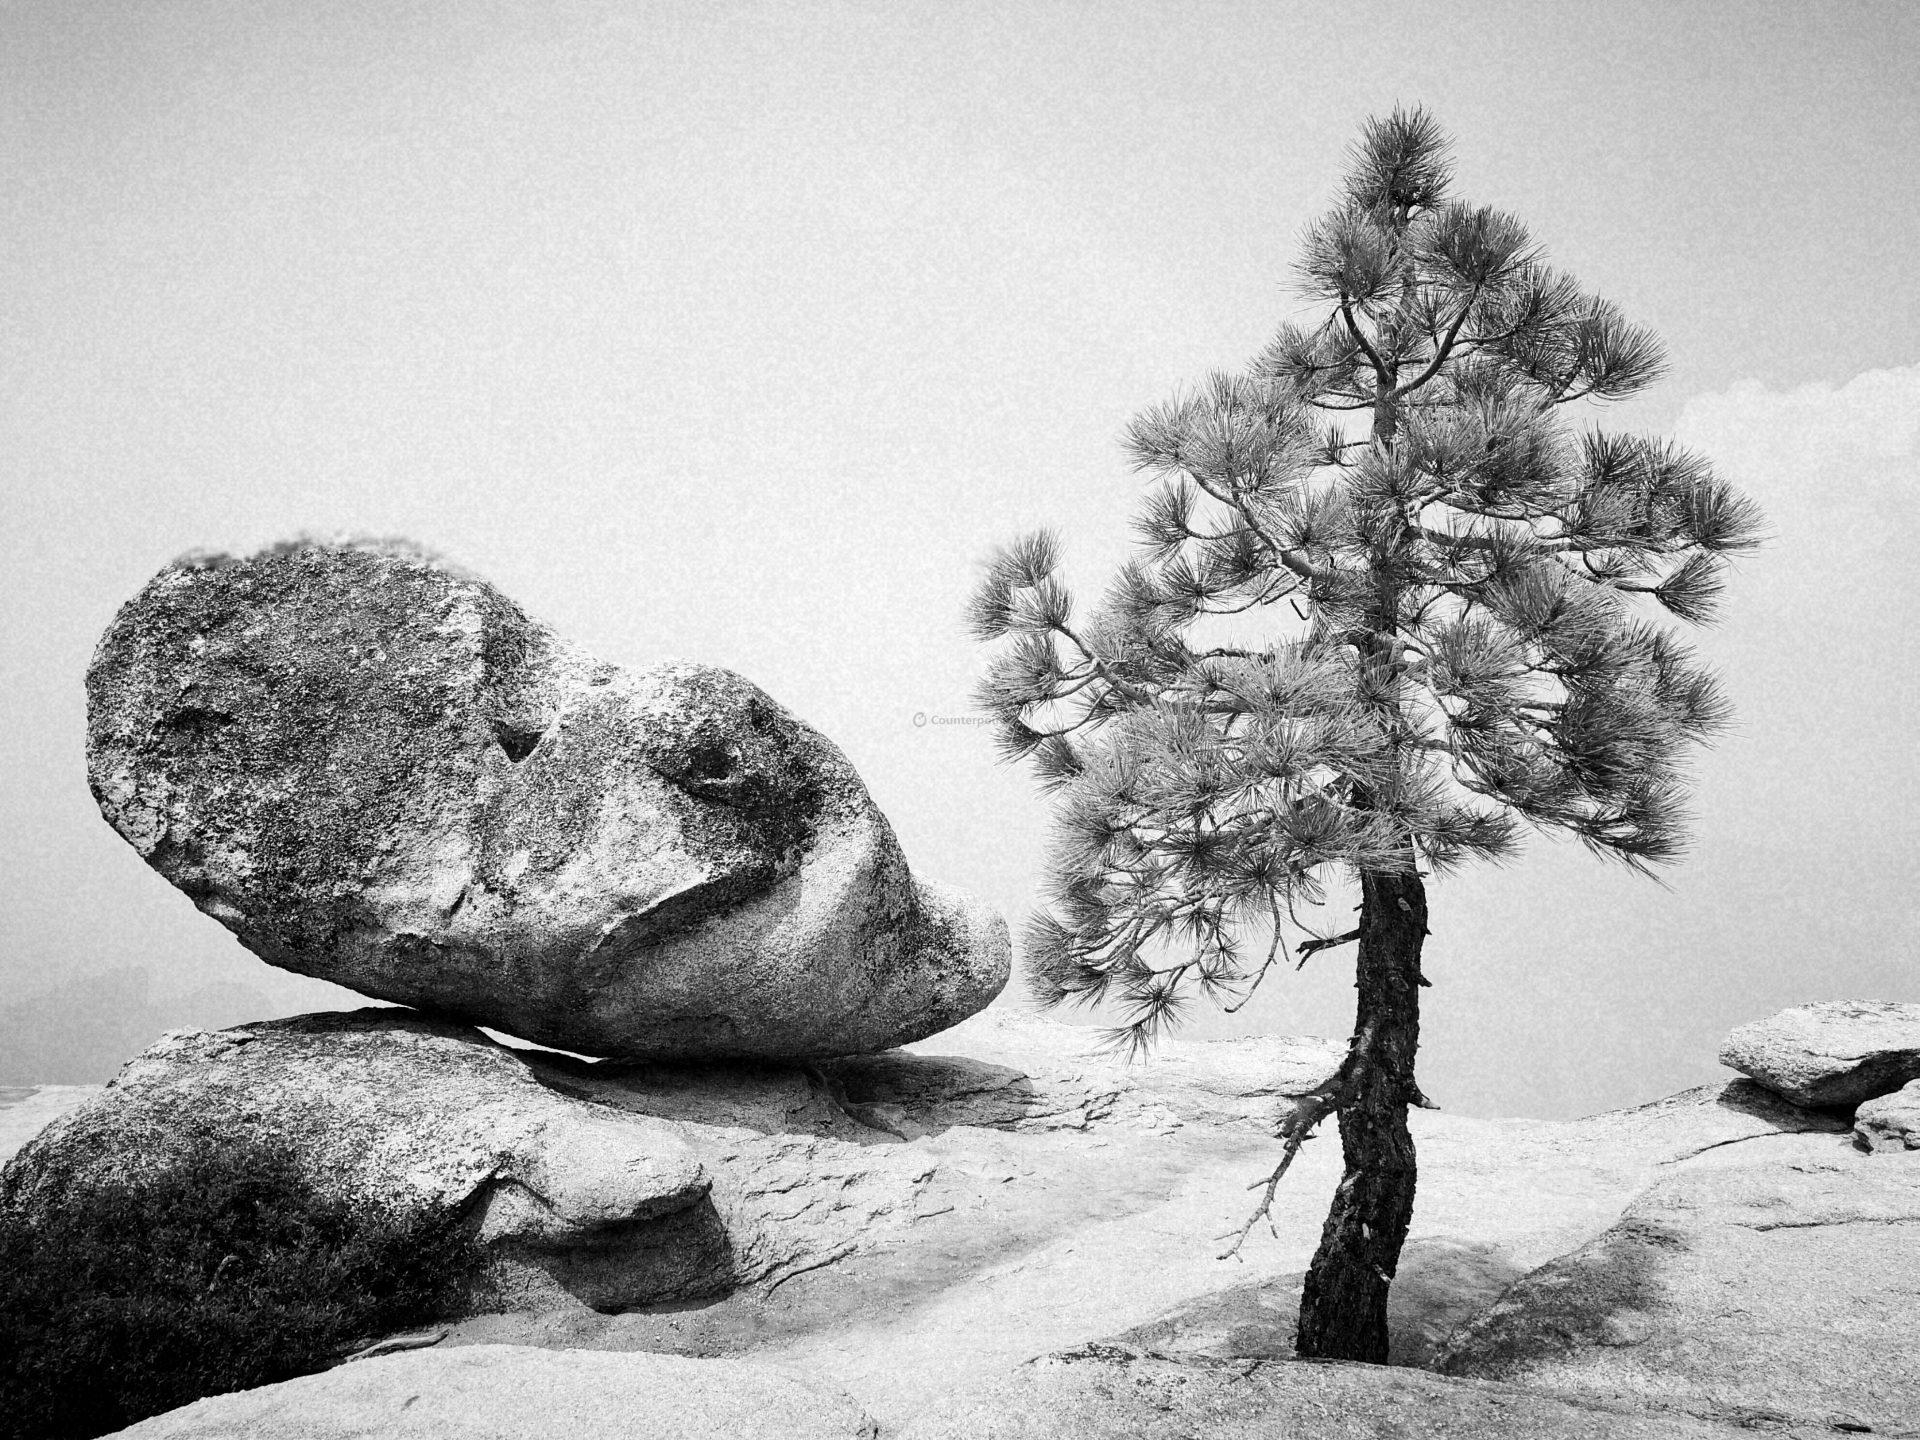 Tree-and-Rock-Yosemite-by-Peter-Huawei-P10